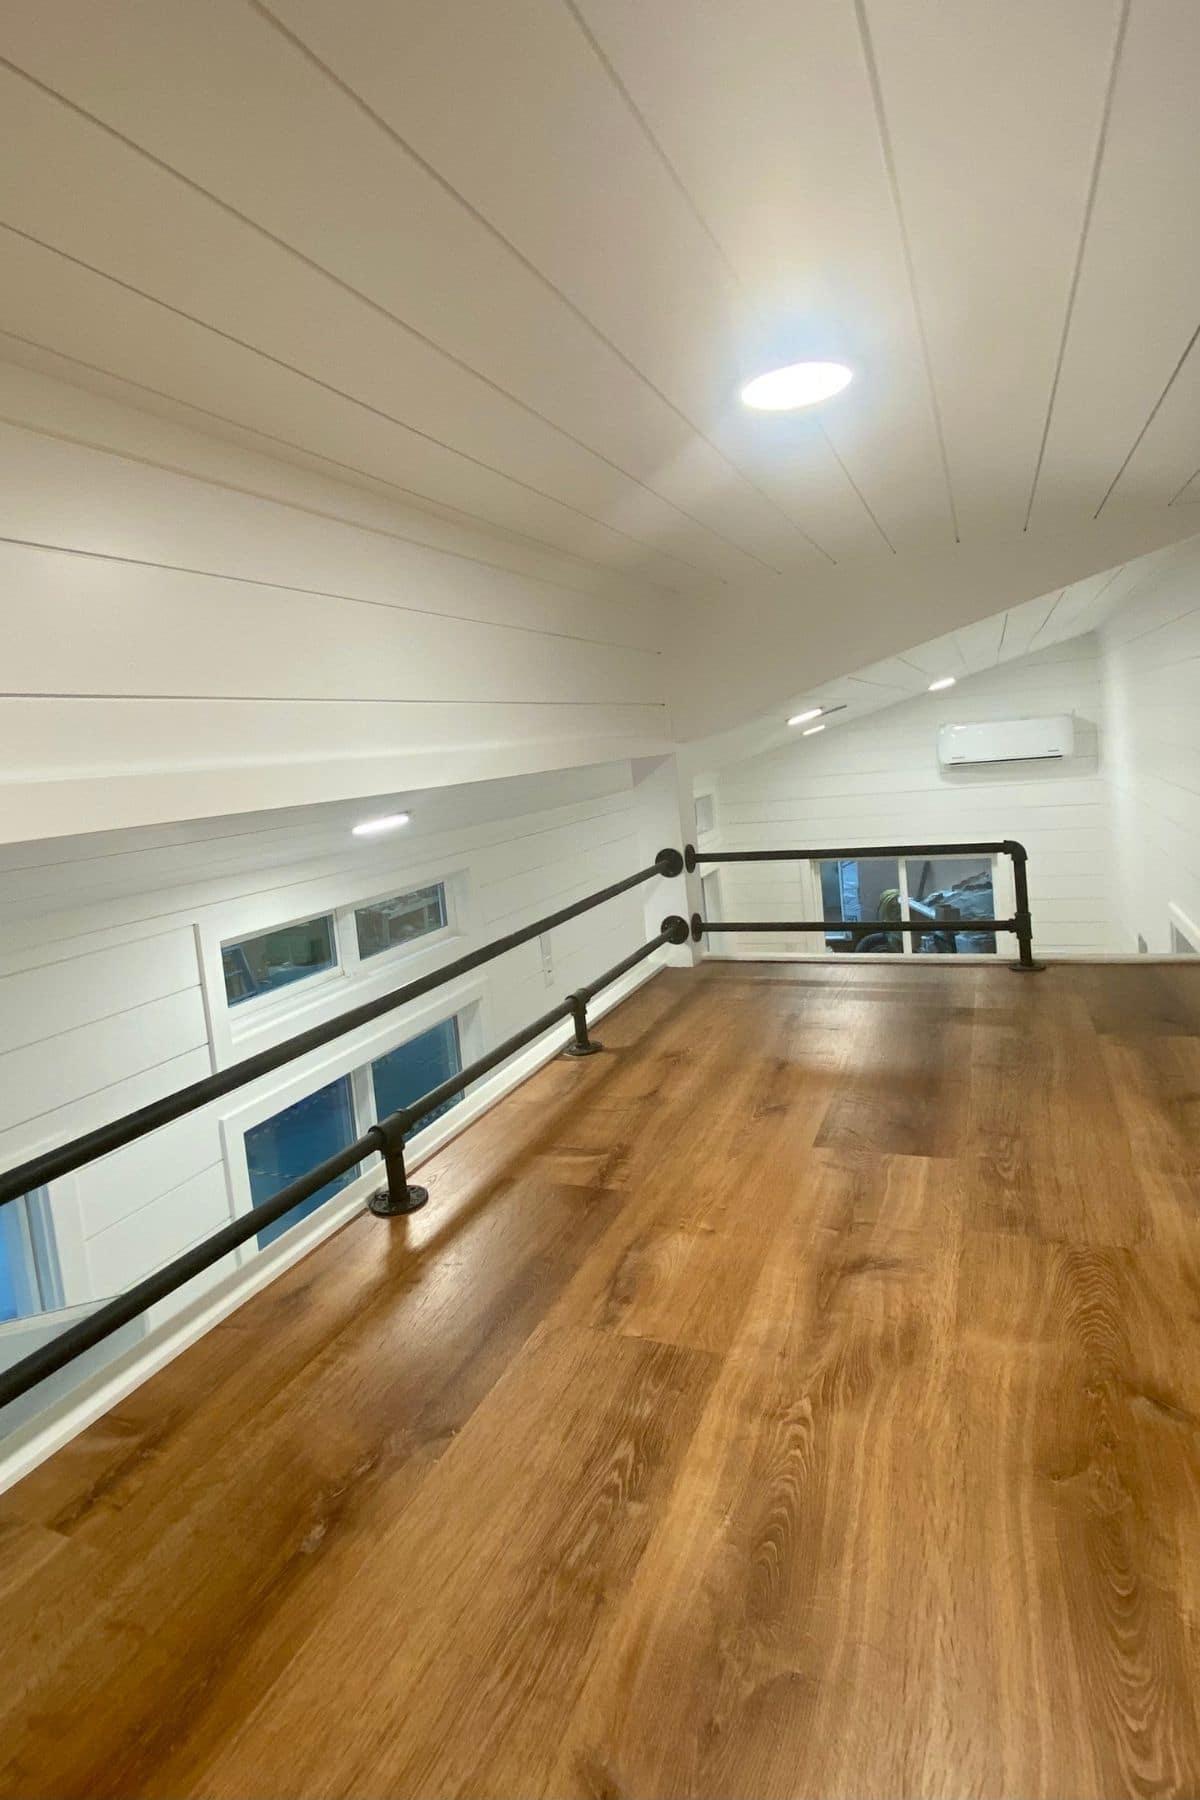 view across loft with black matte railing on left side